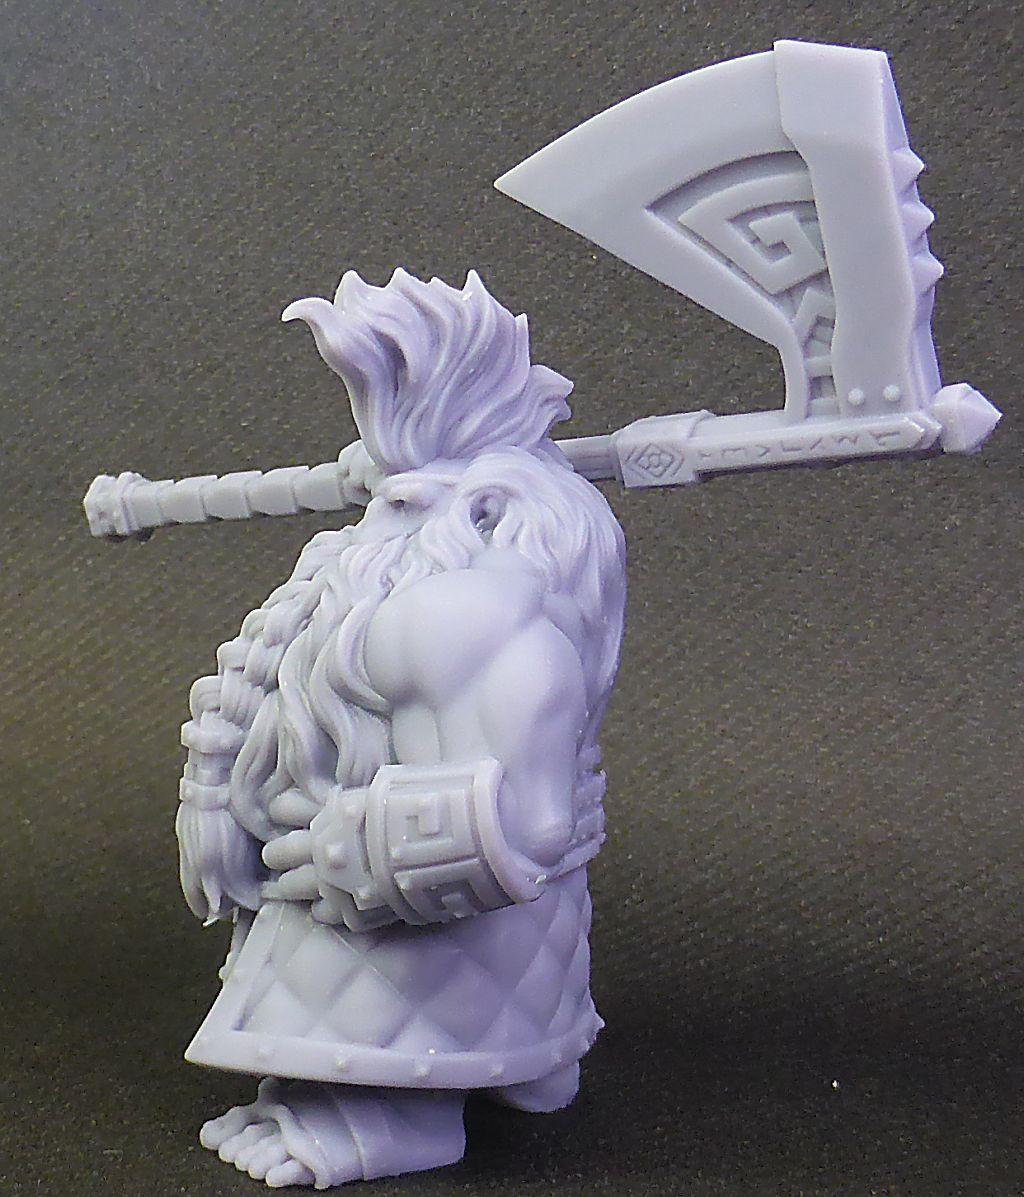 Impression 3D Résine - Figurine de Nain Nain-014